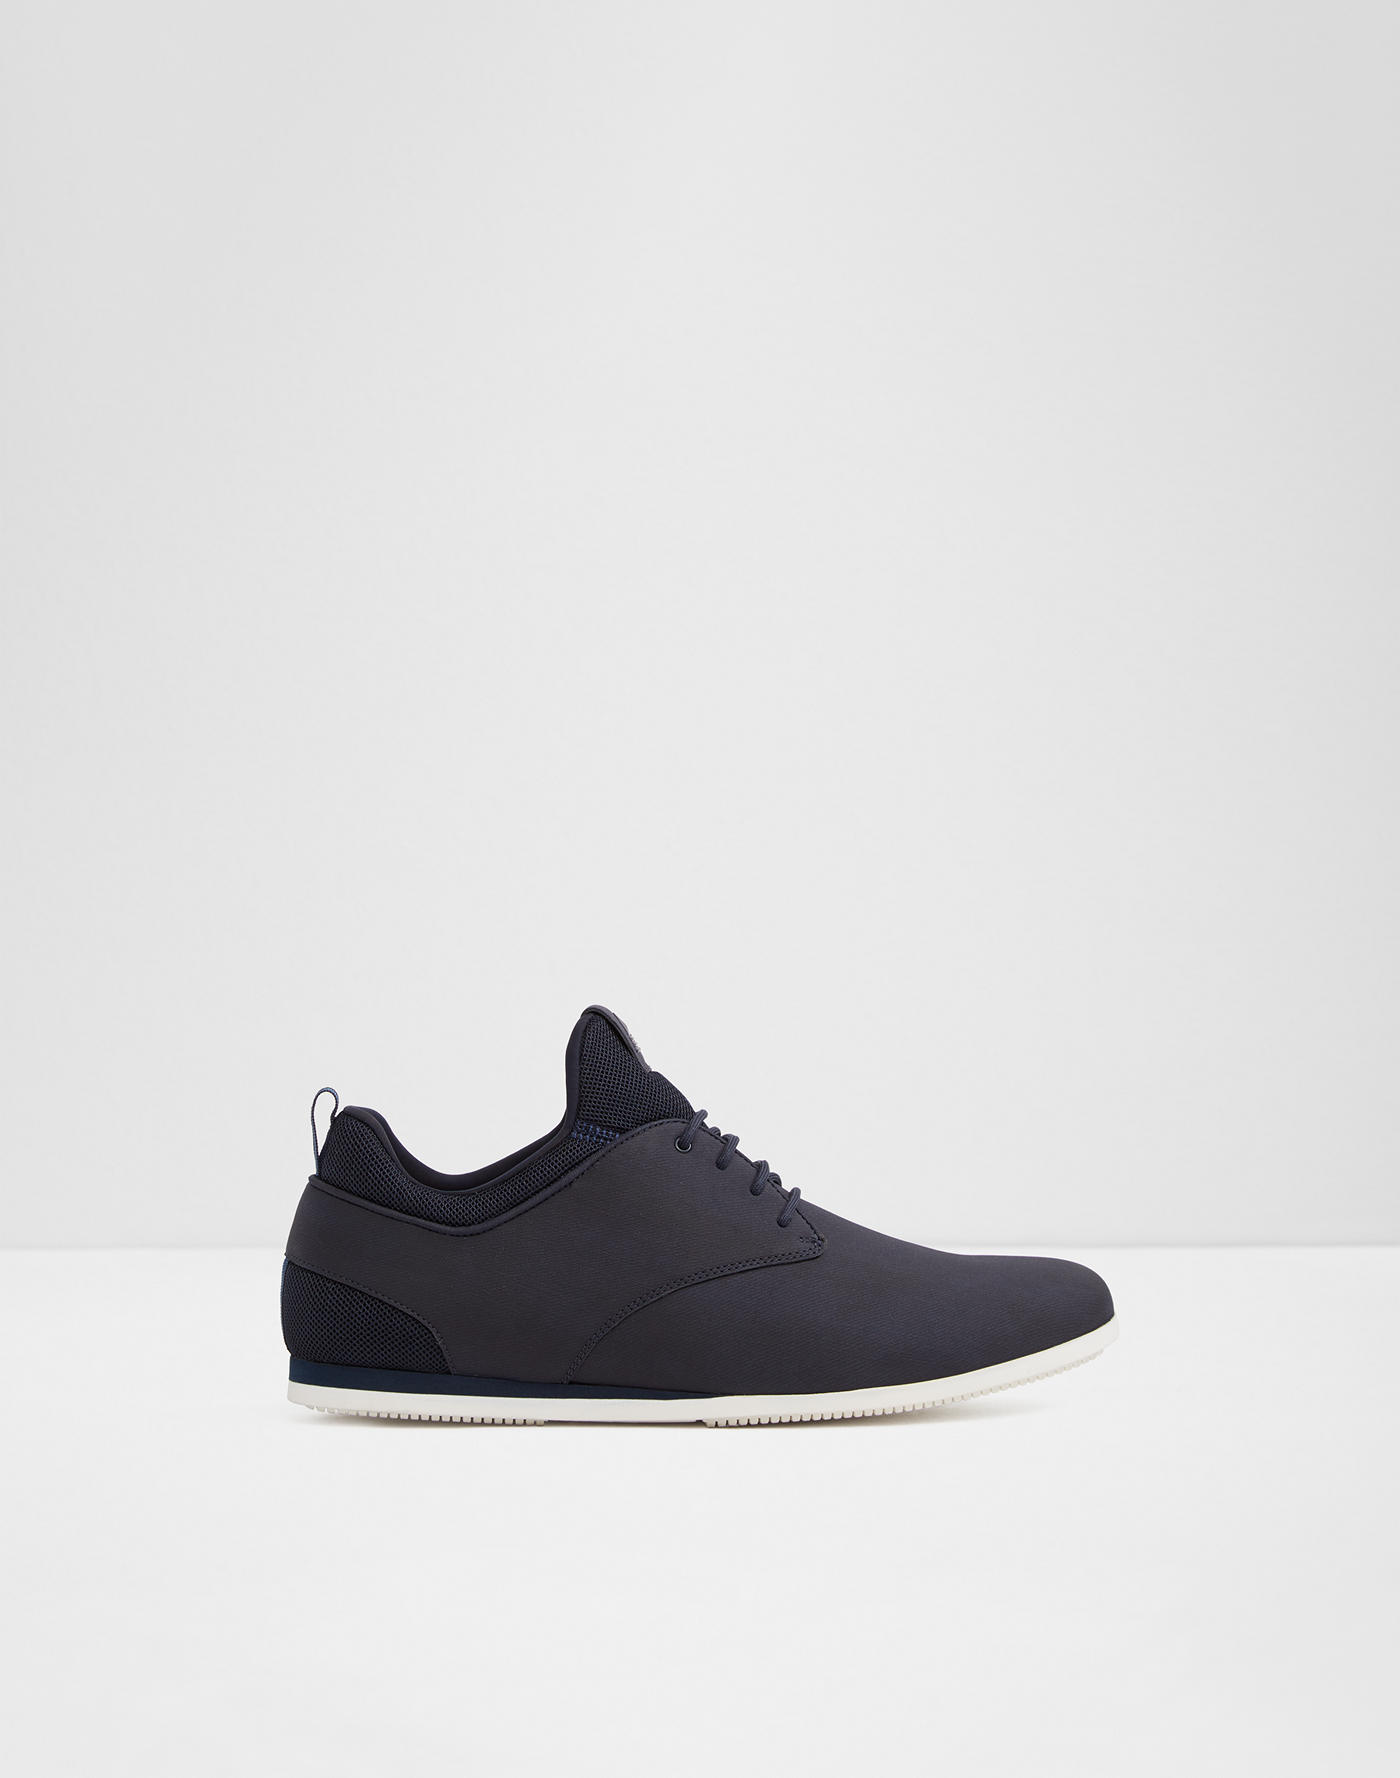 909a73e4d96 Sneakers